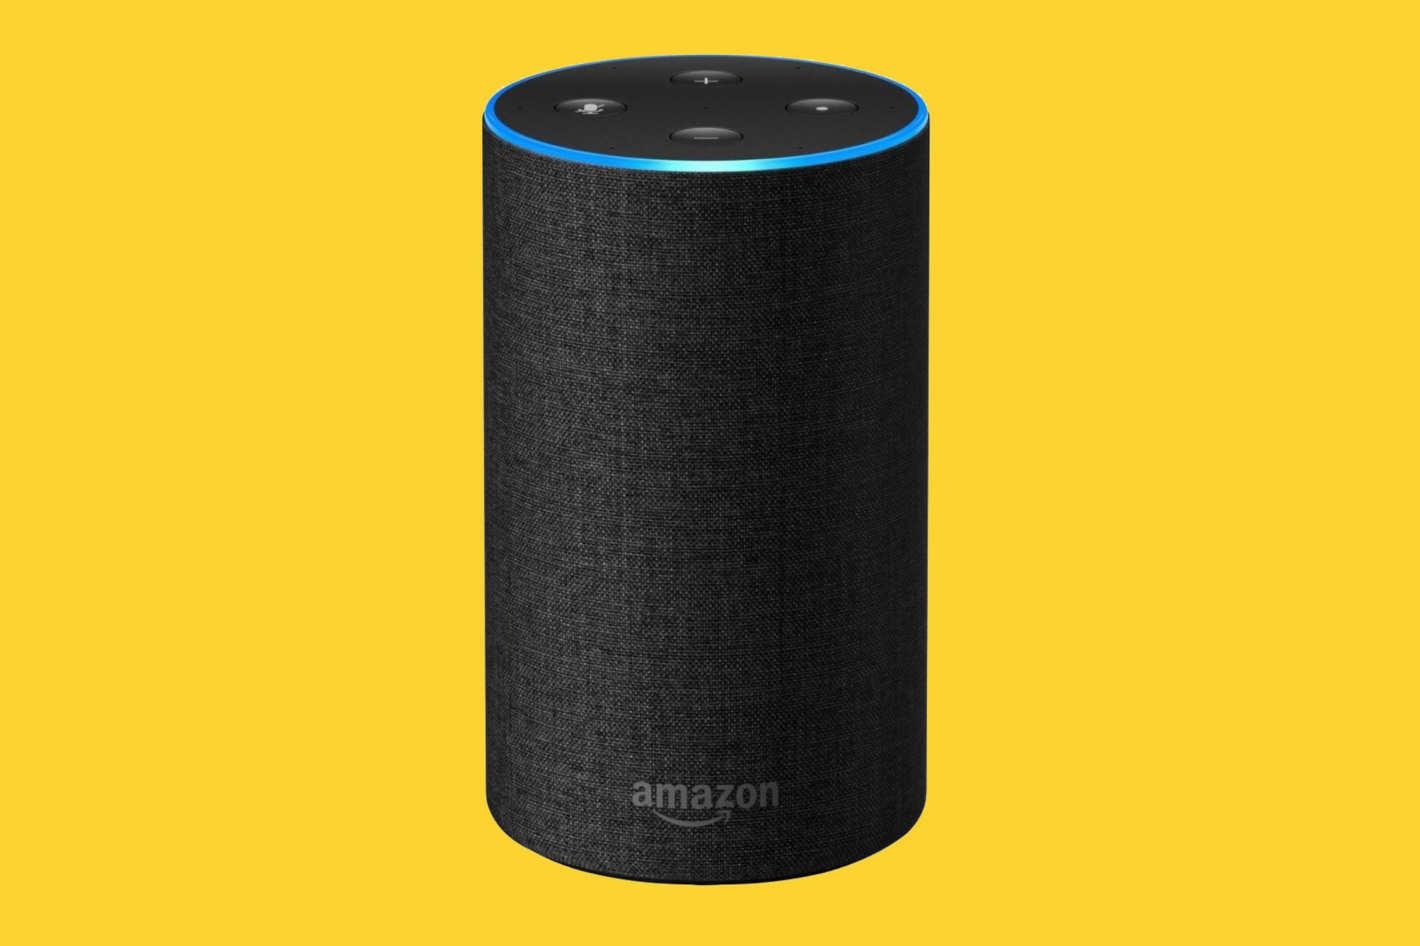 An Amazon Echo.